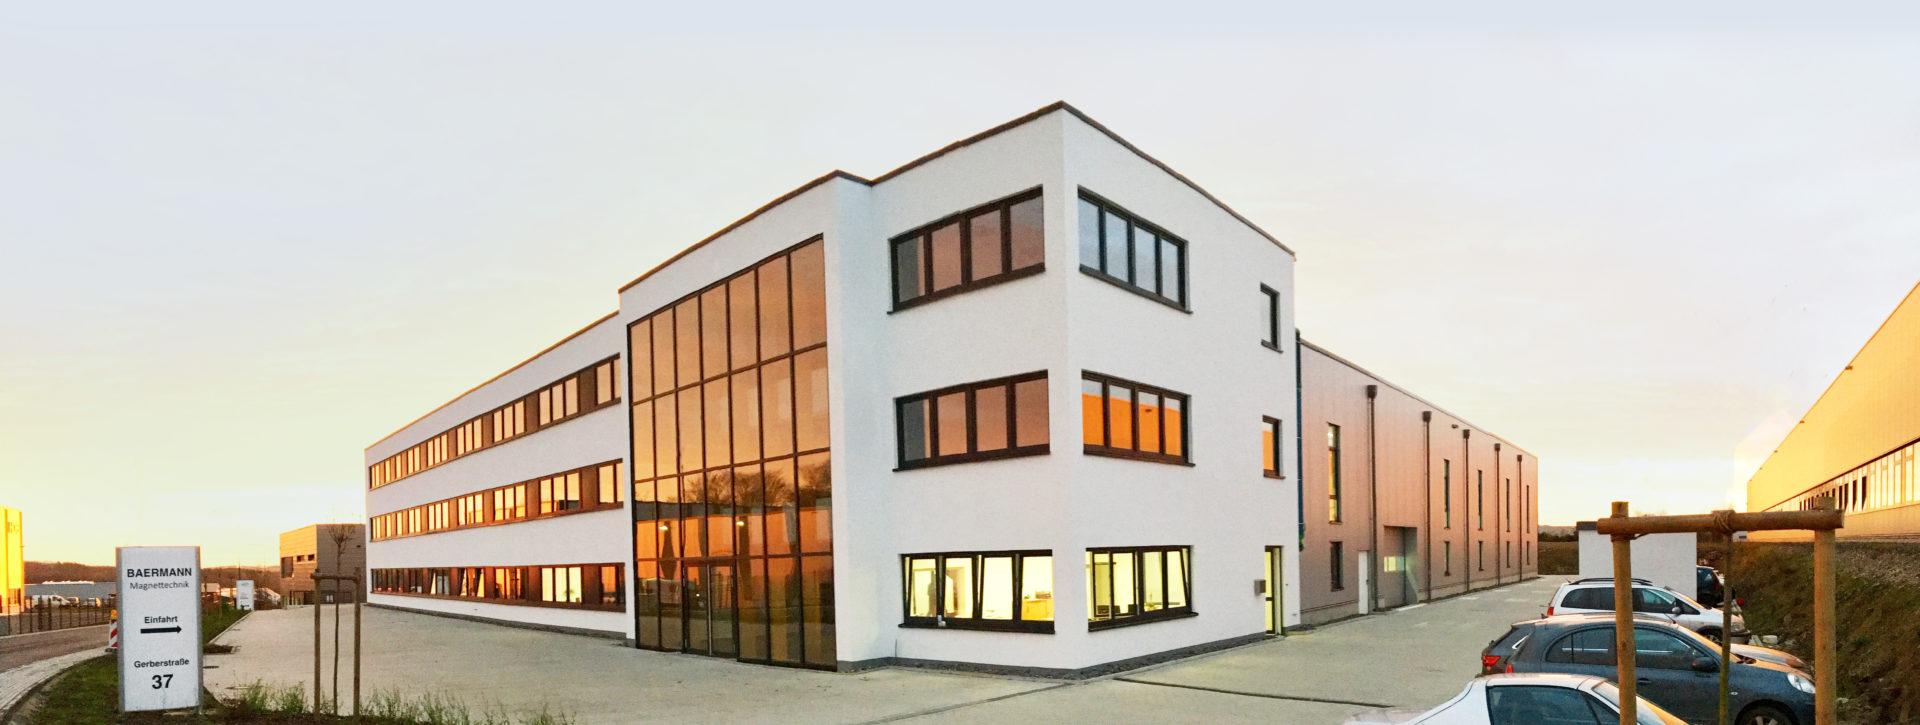 Baermann Gmbh Lindlar Magnete Kunststoffgebunden Industrie